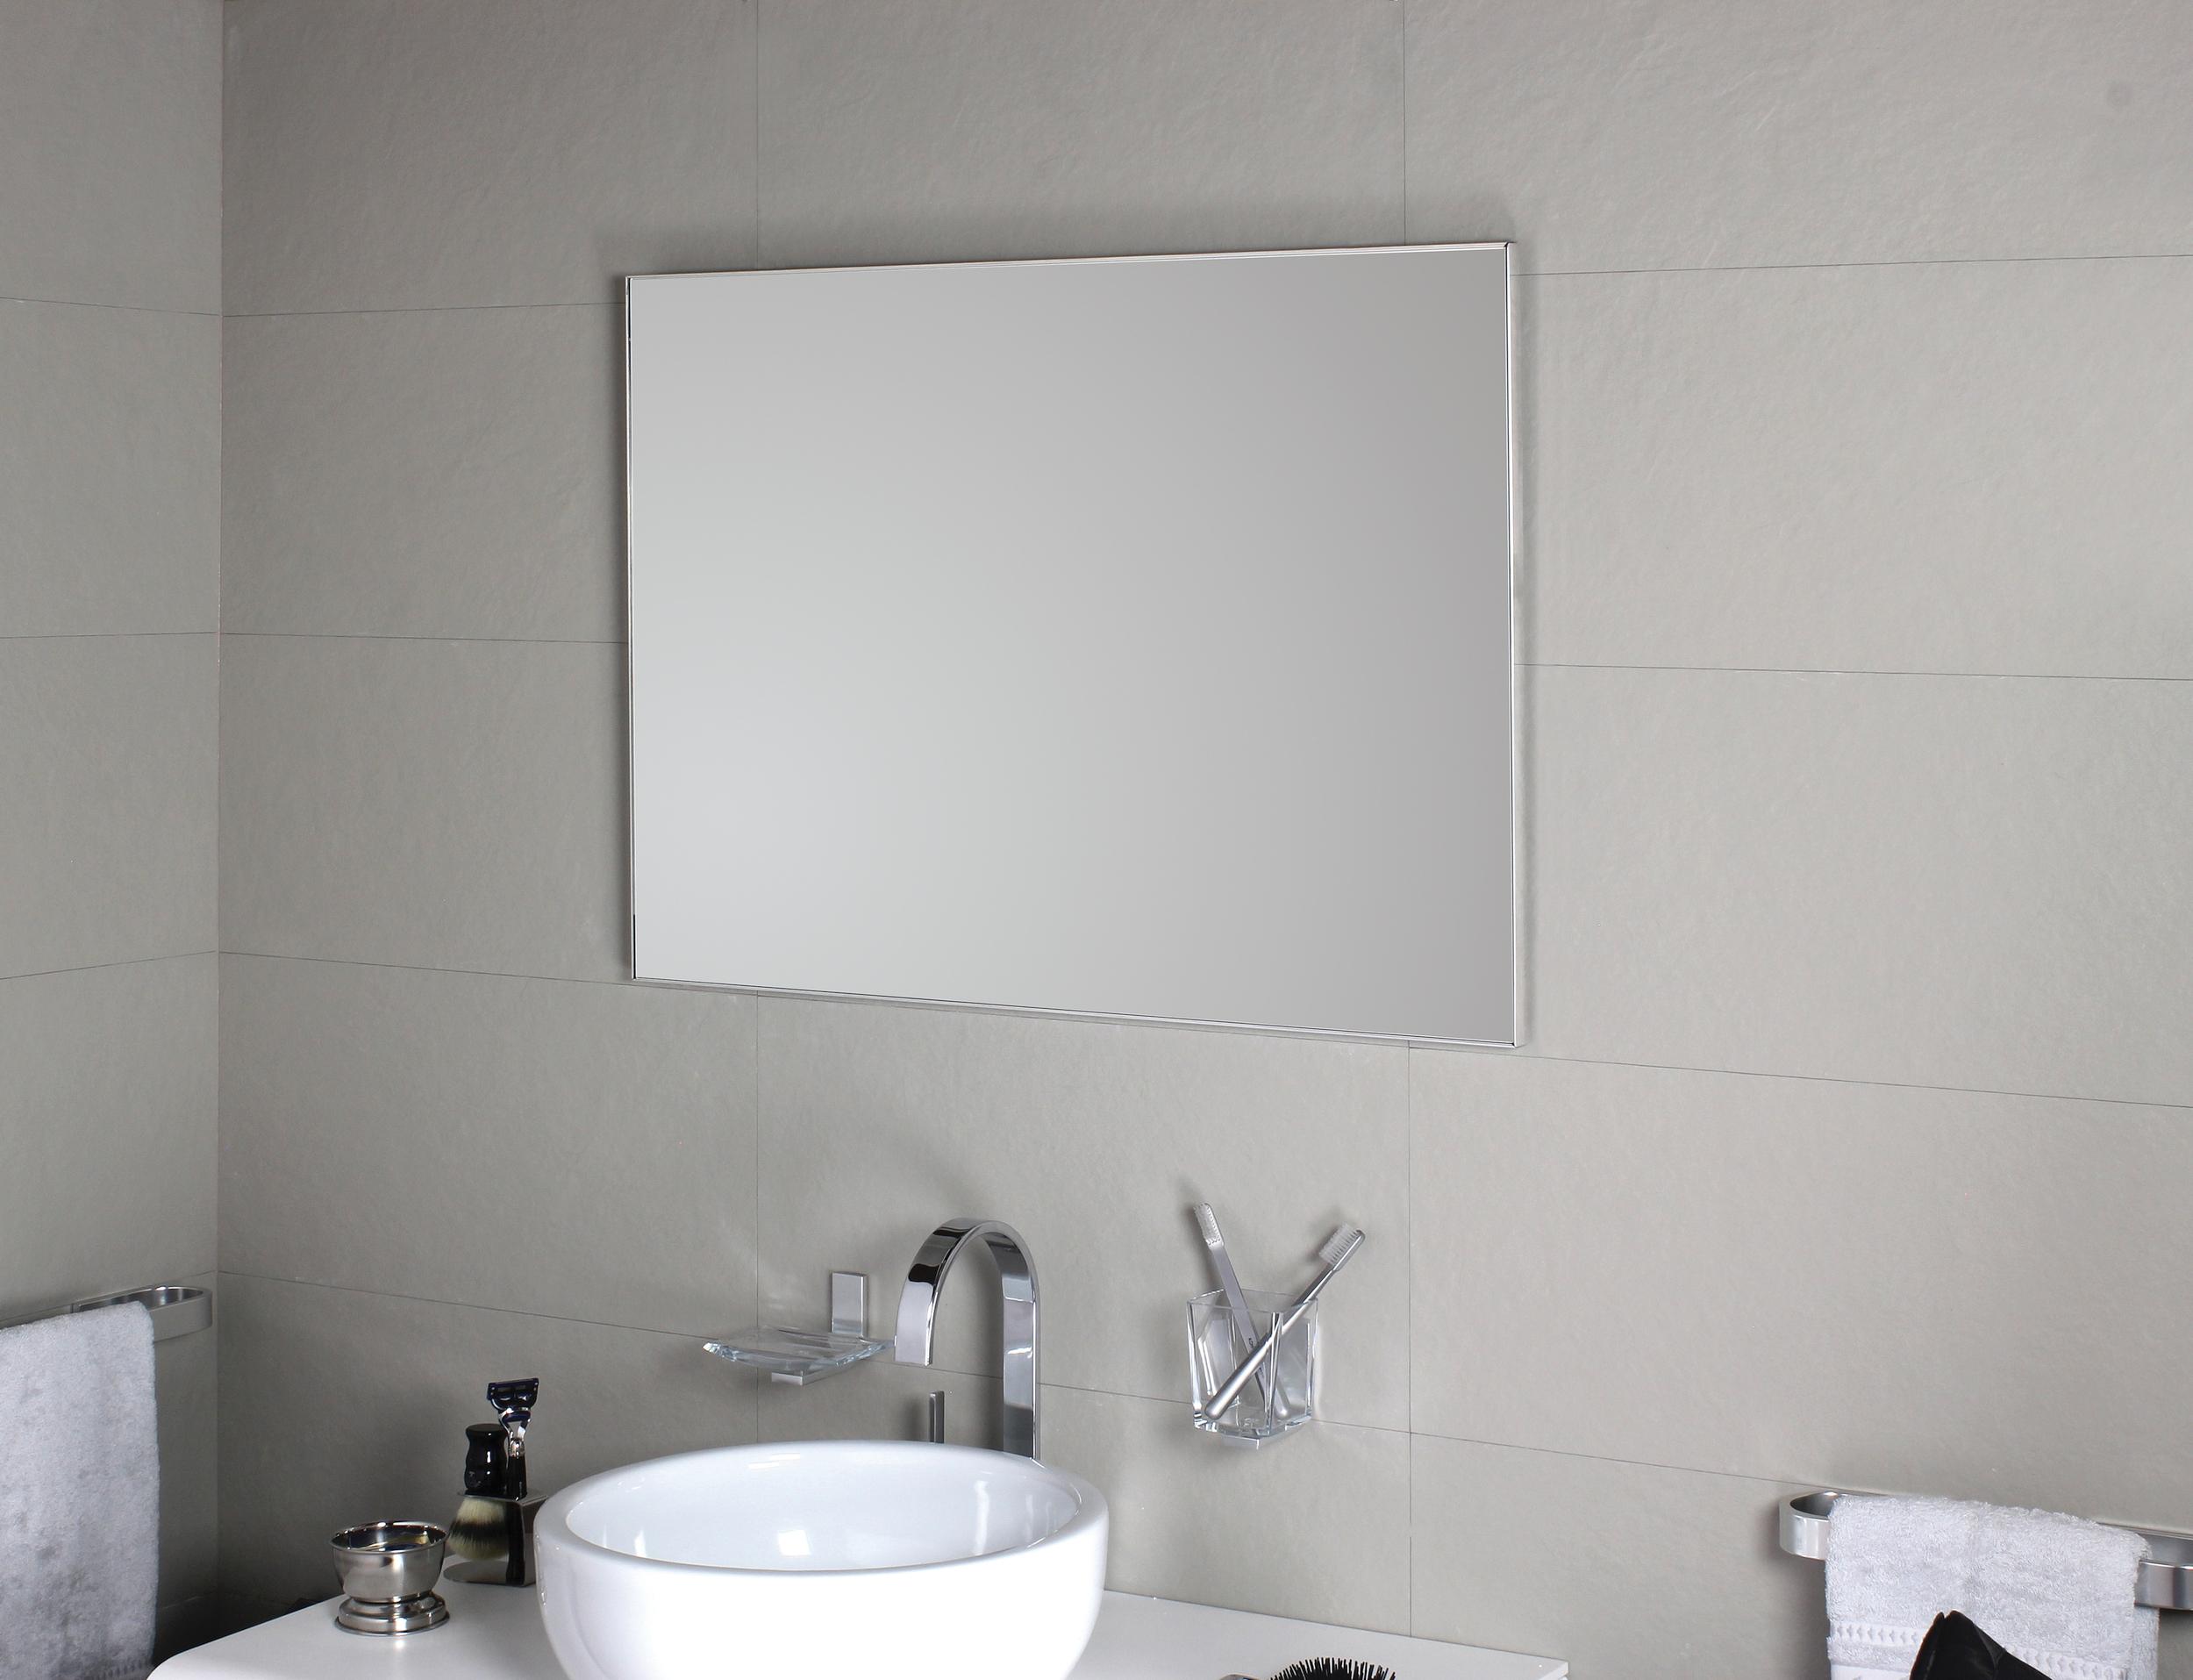 koh i noor filo lucido cornice spiegel mit rahmen 504 x 704 mm c45607. Black Bedroom Furniture Sets. Home Design Ideas